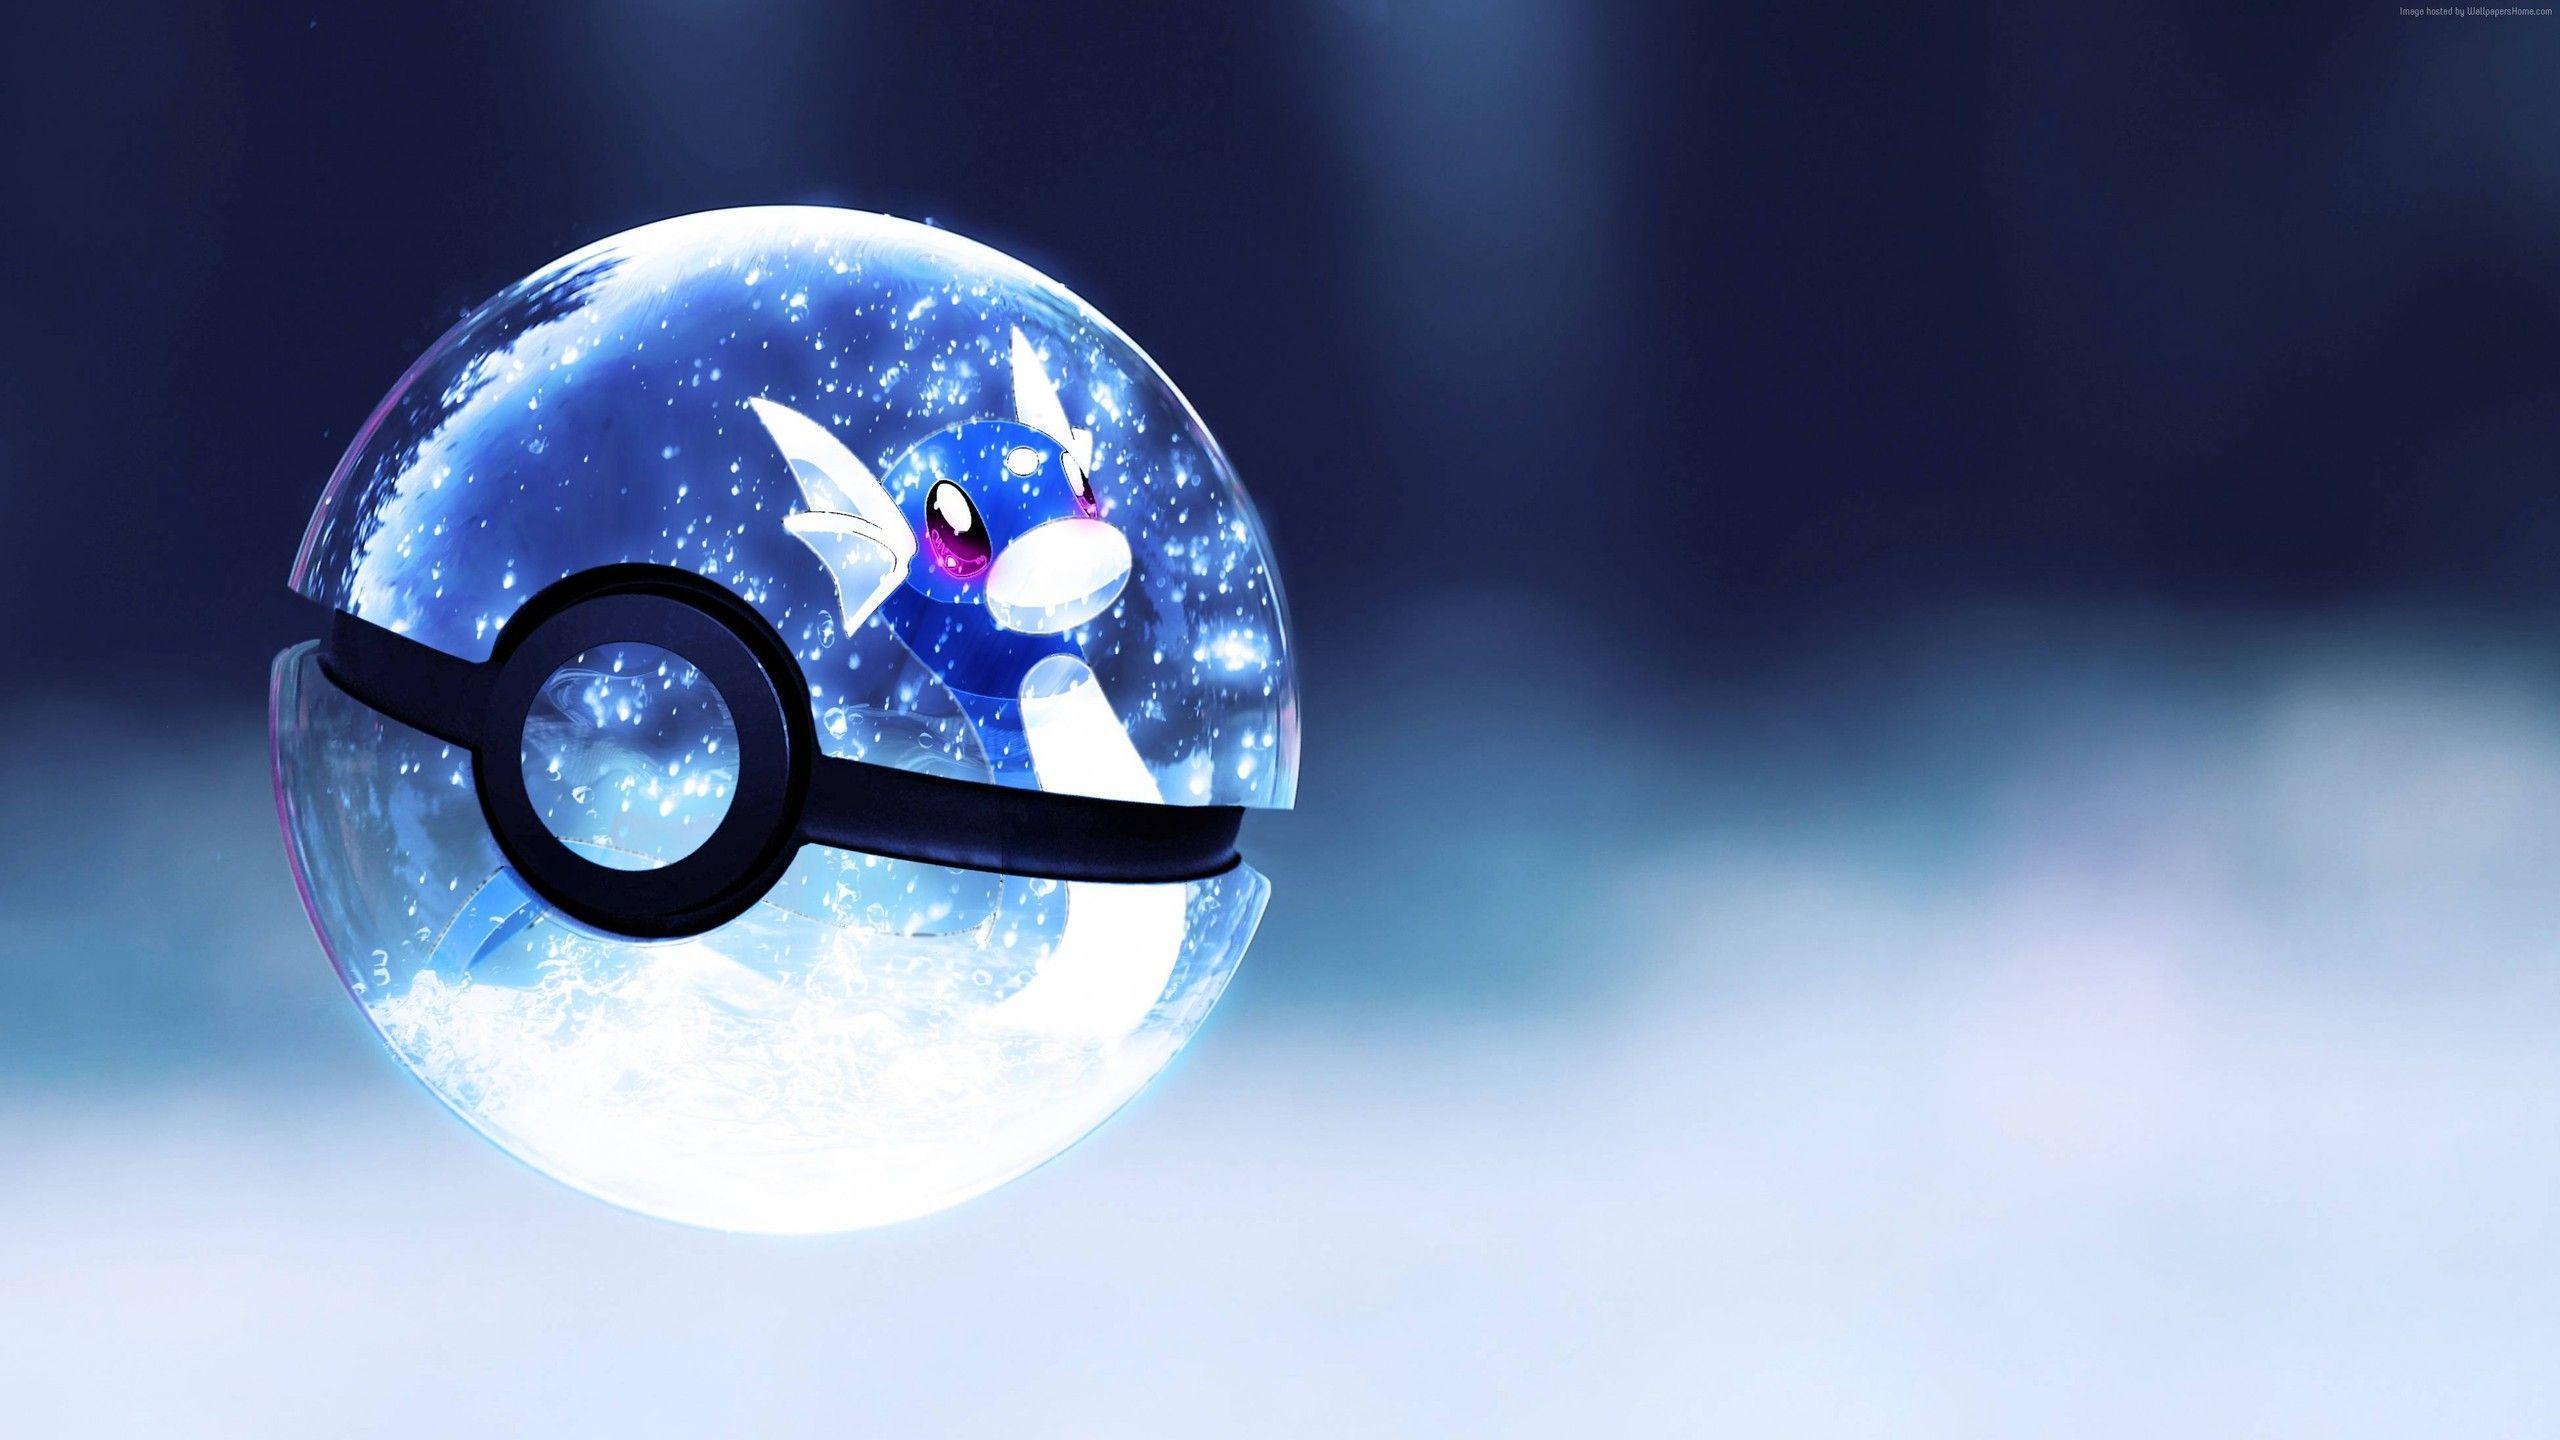 3D Pokémon Go Wallpapers - Top Free 3D Pokémon Go ...